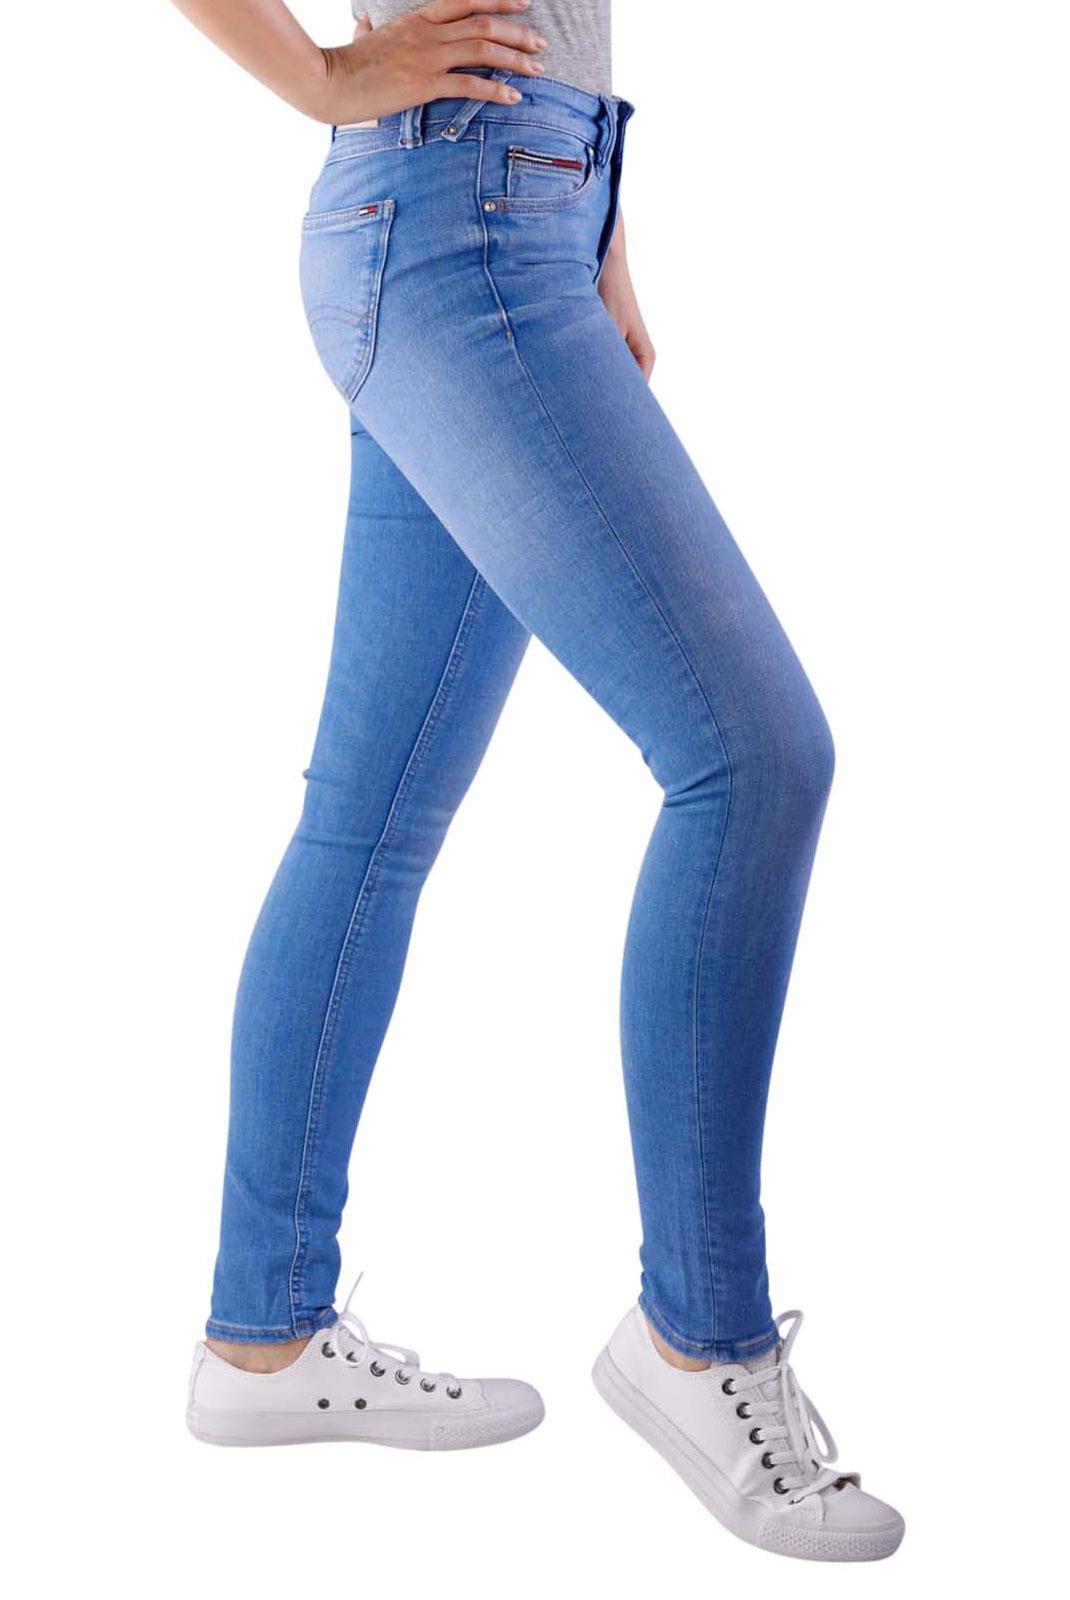 Femme  Tommy Jeans DW0DW01626911 911 DYNAMIC ELECTRIC MID STRETCH